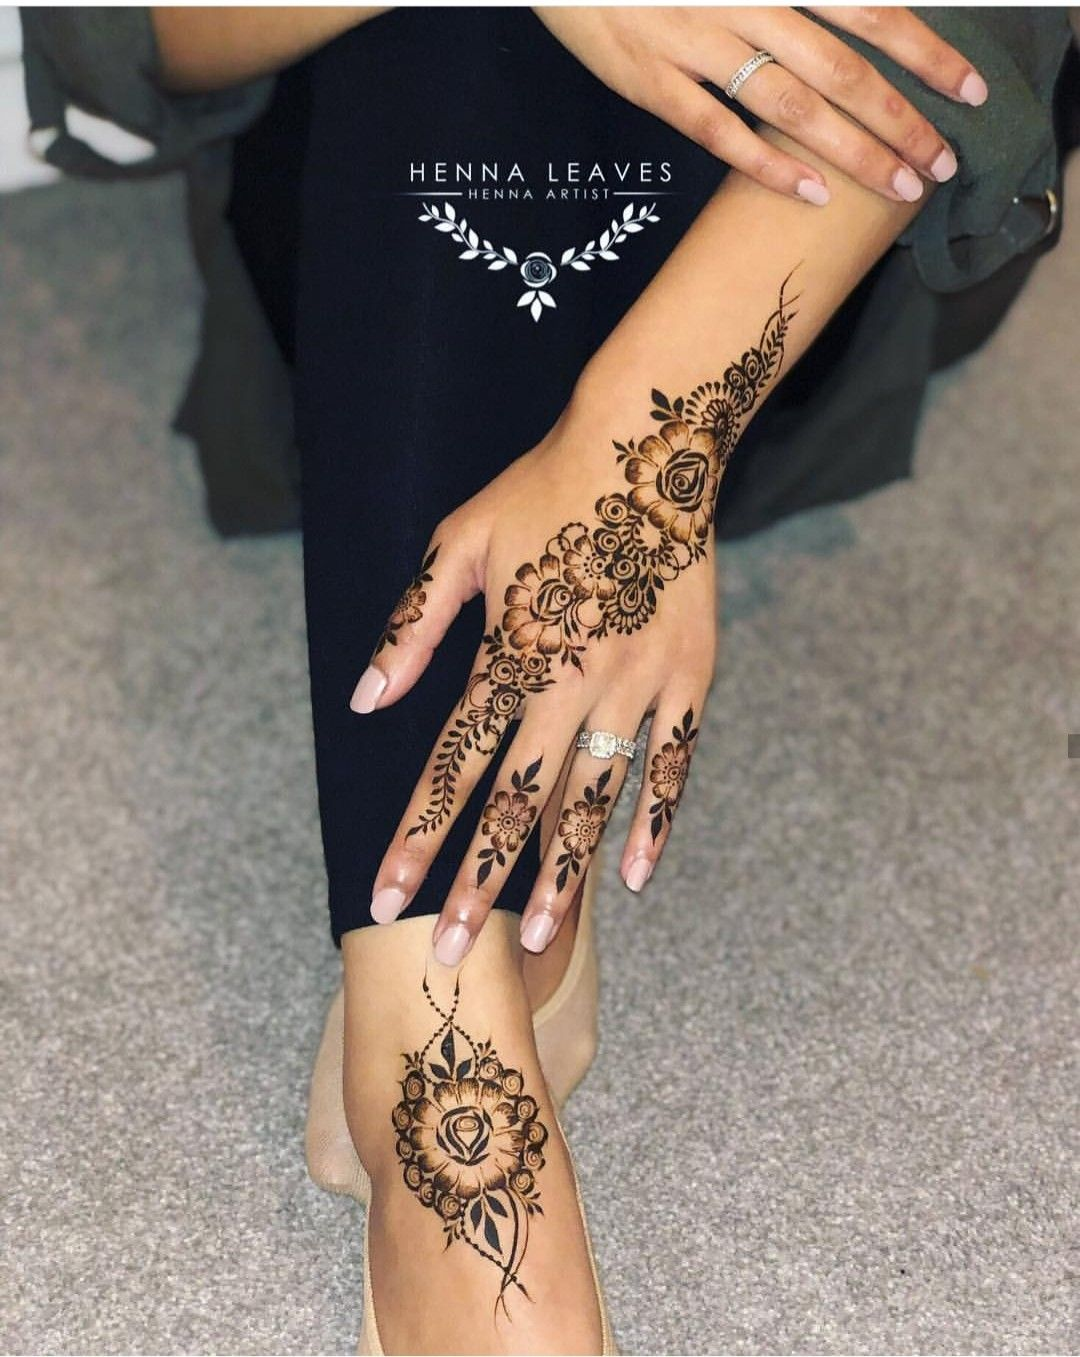 Pin By Mirela Aljic On Henna Tattoos Henna Tattoo Designs Henna